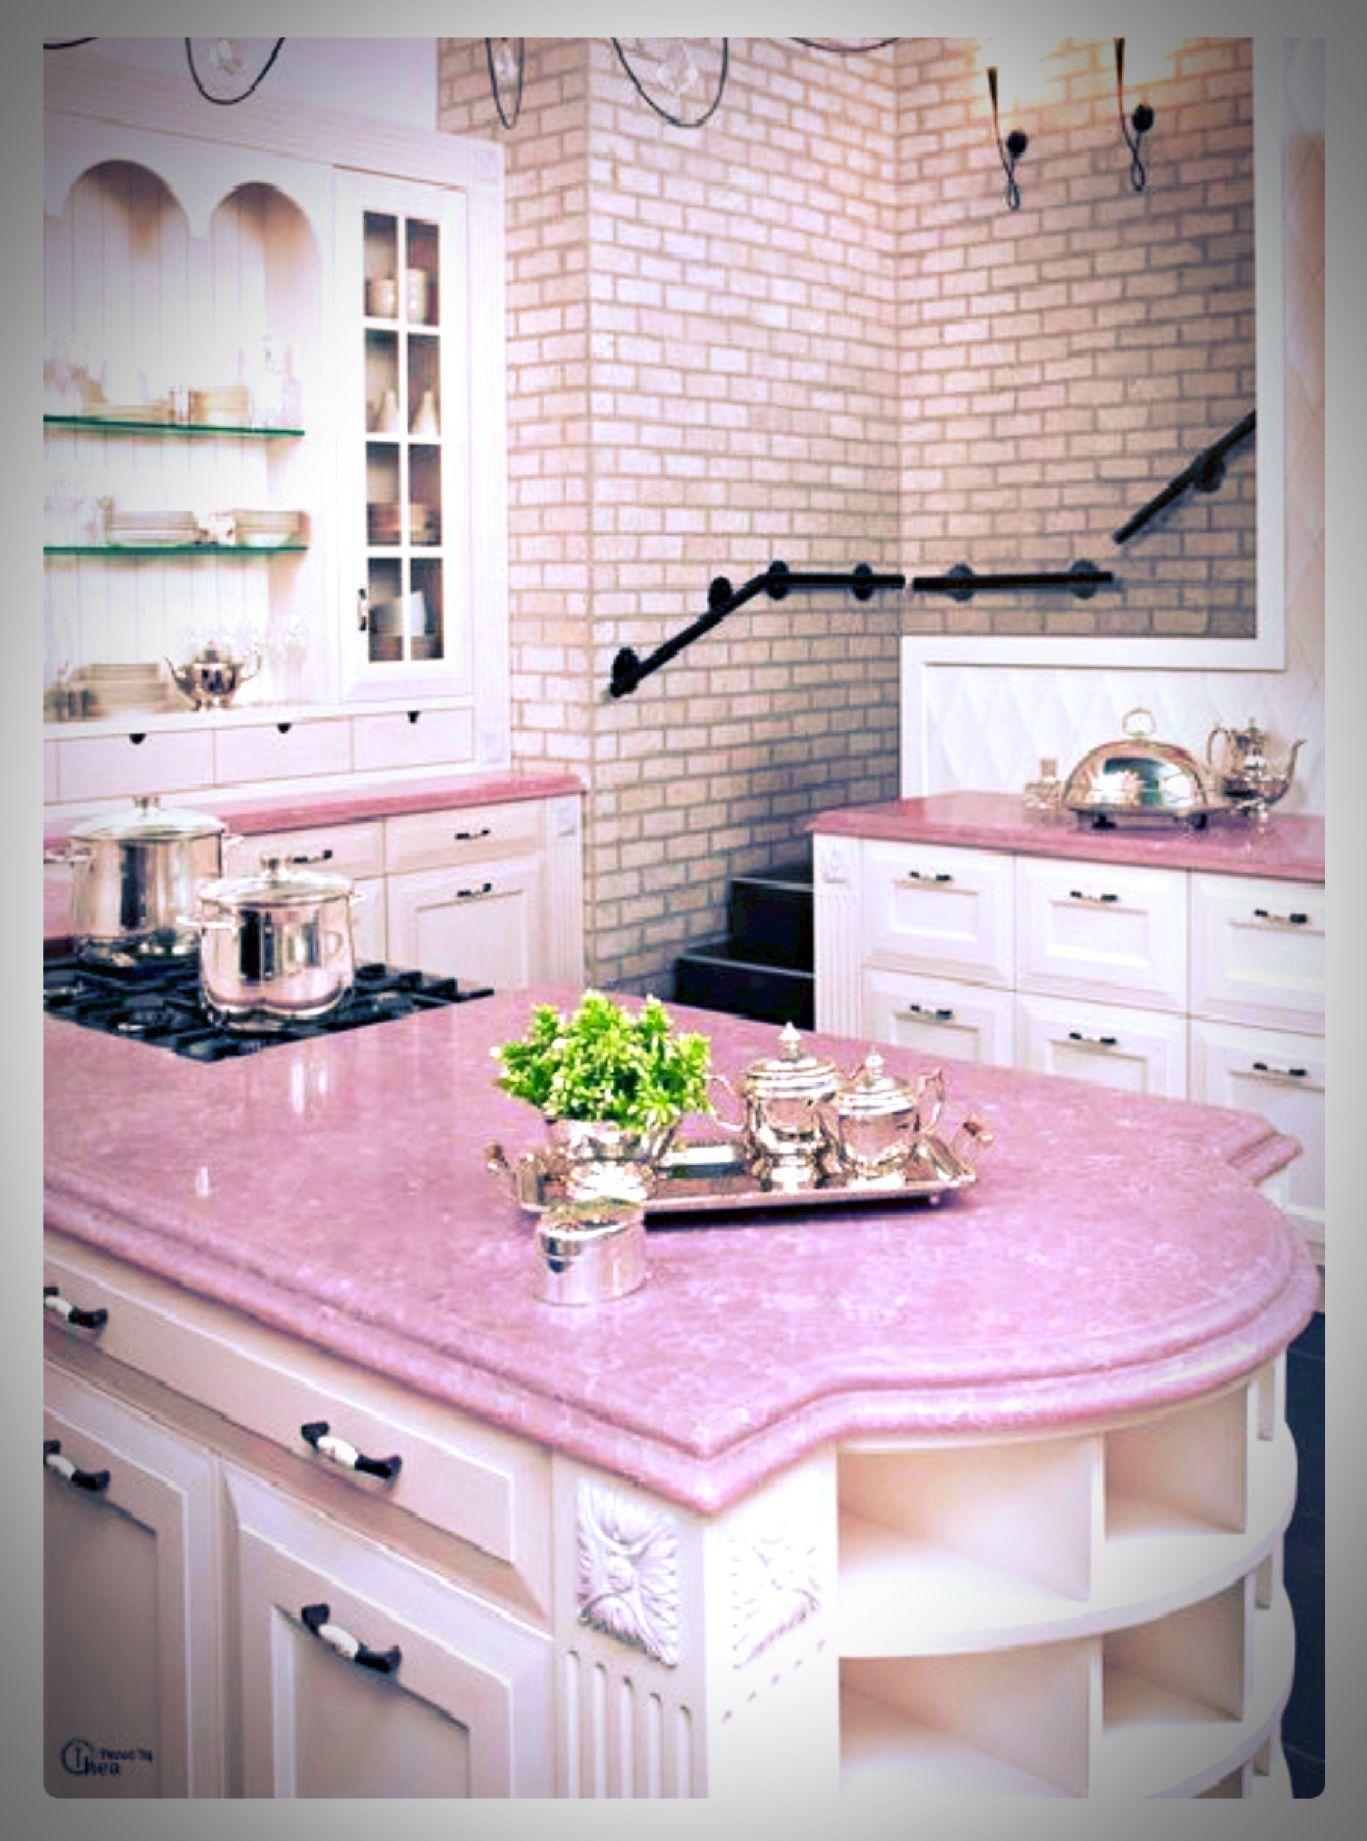 Pink kitchen done right Pink kitchen, Shabby chic